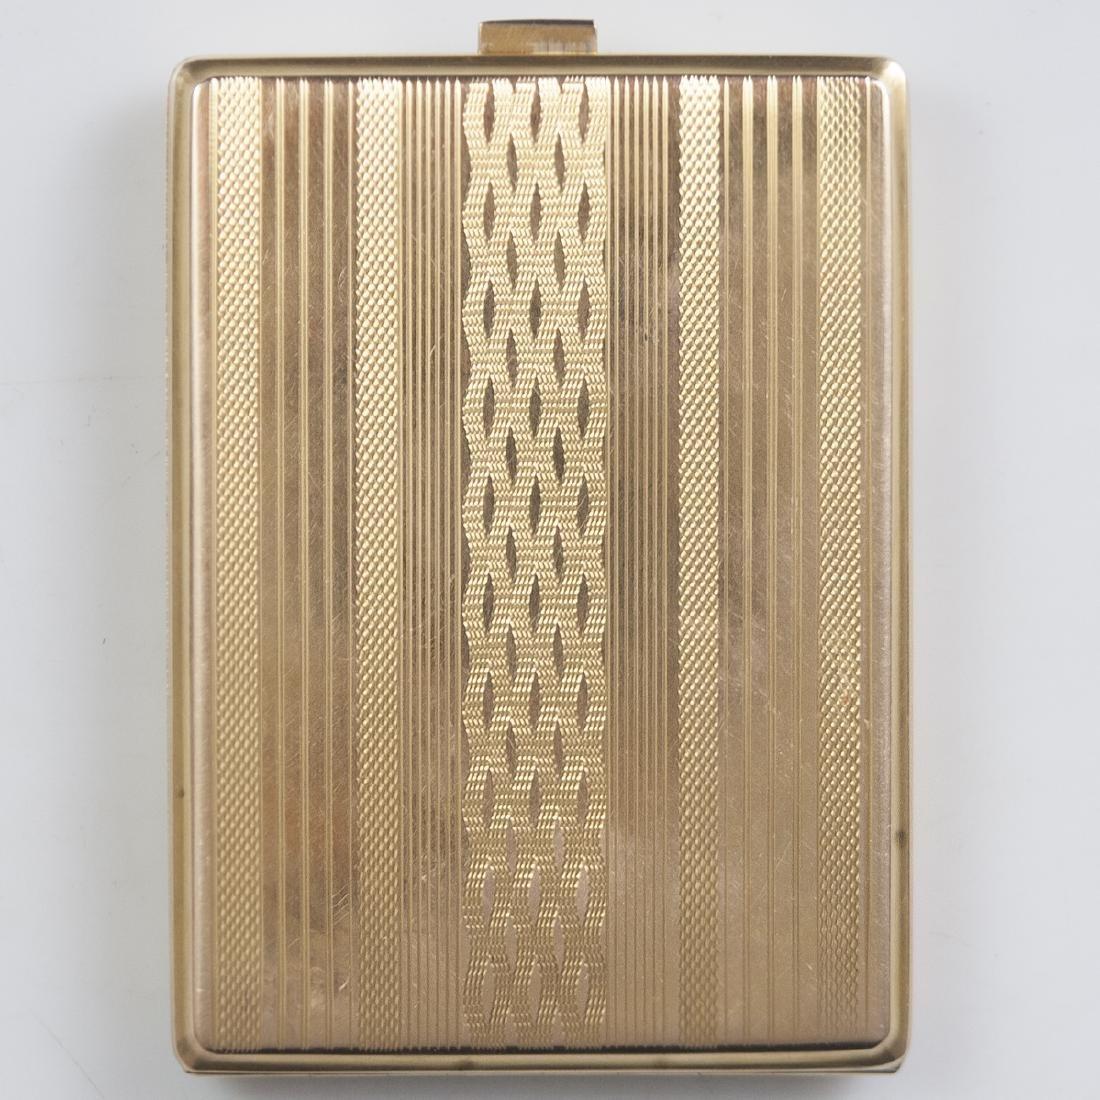 Antique 14kt Gold Cigarette Case